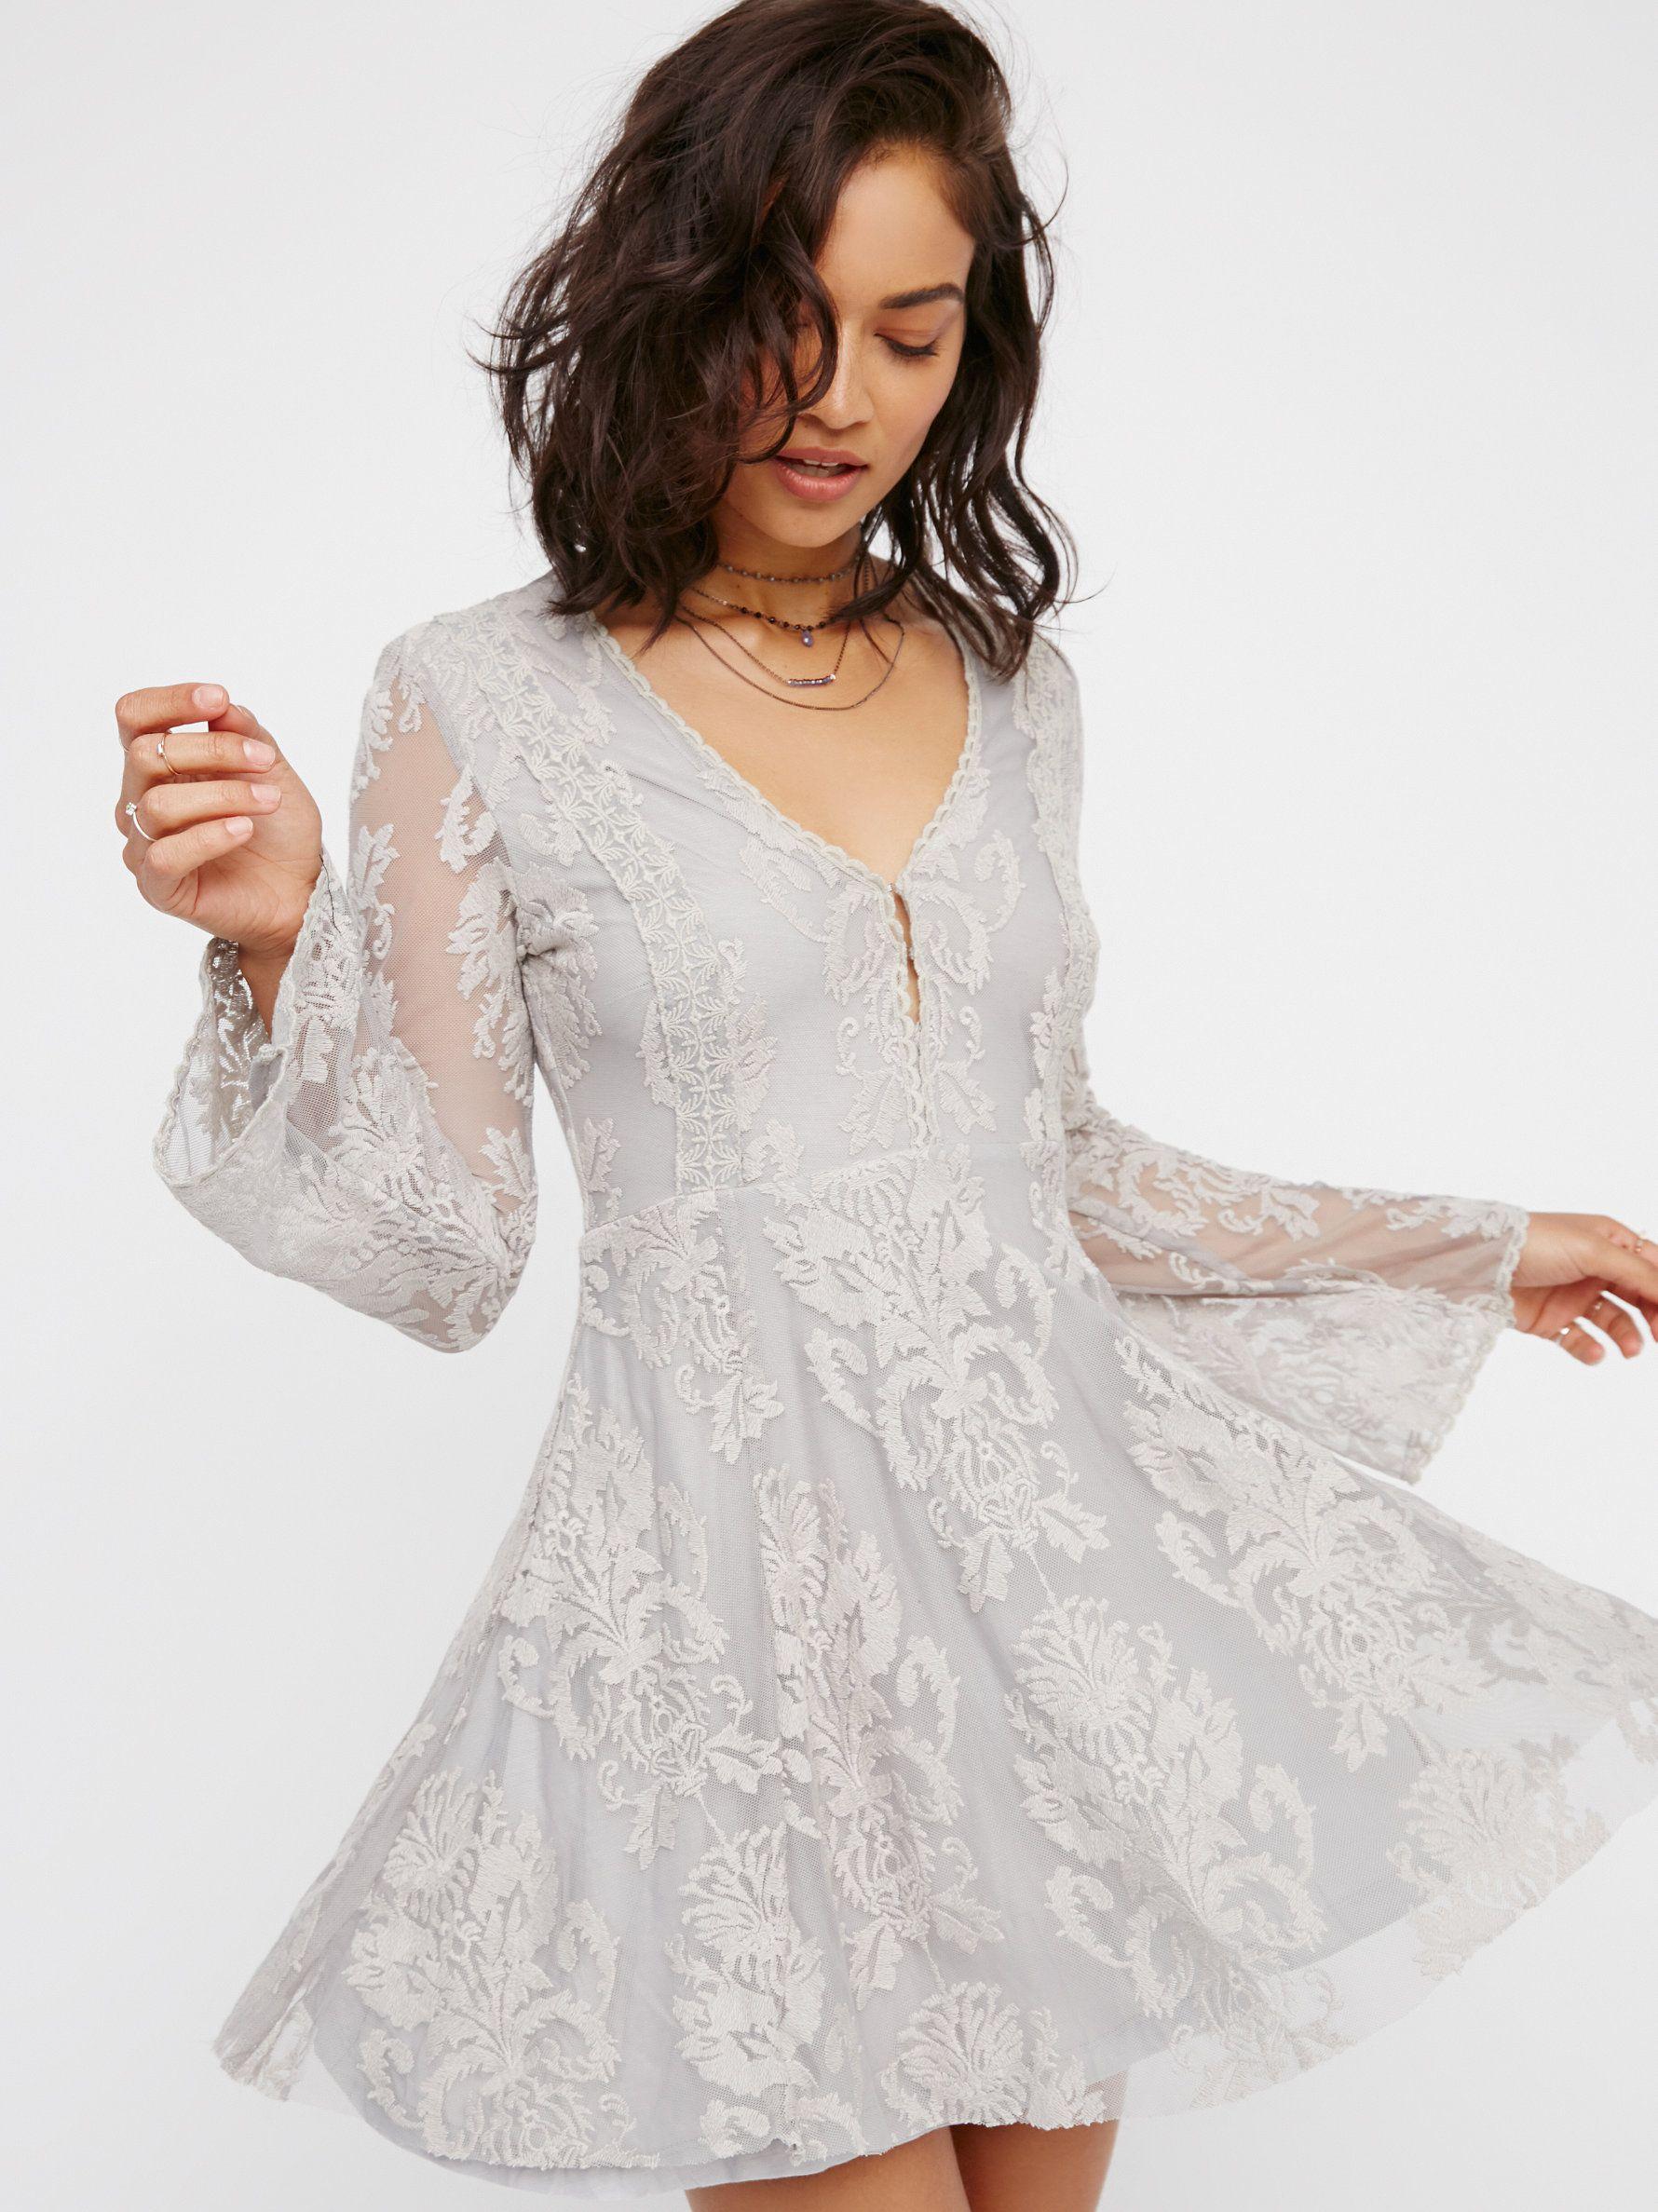 Reign Over Me Lace Dress | White boho dress, Free people ...